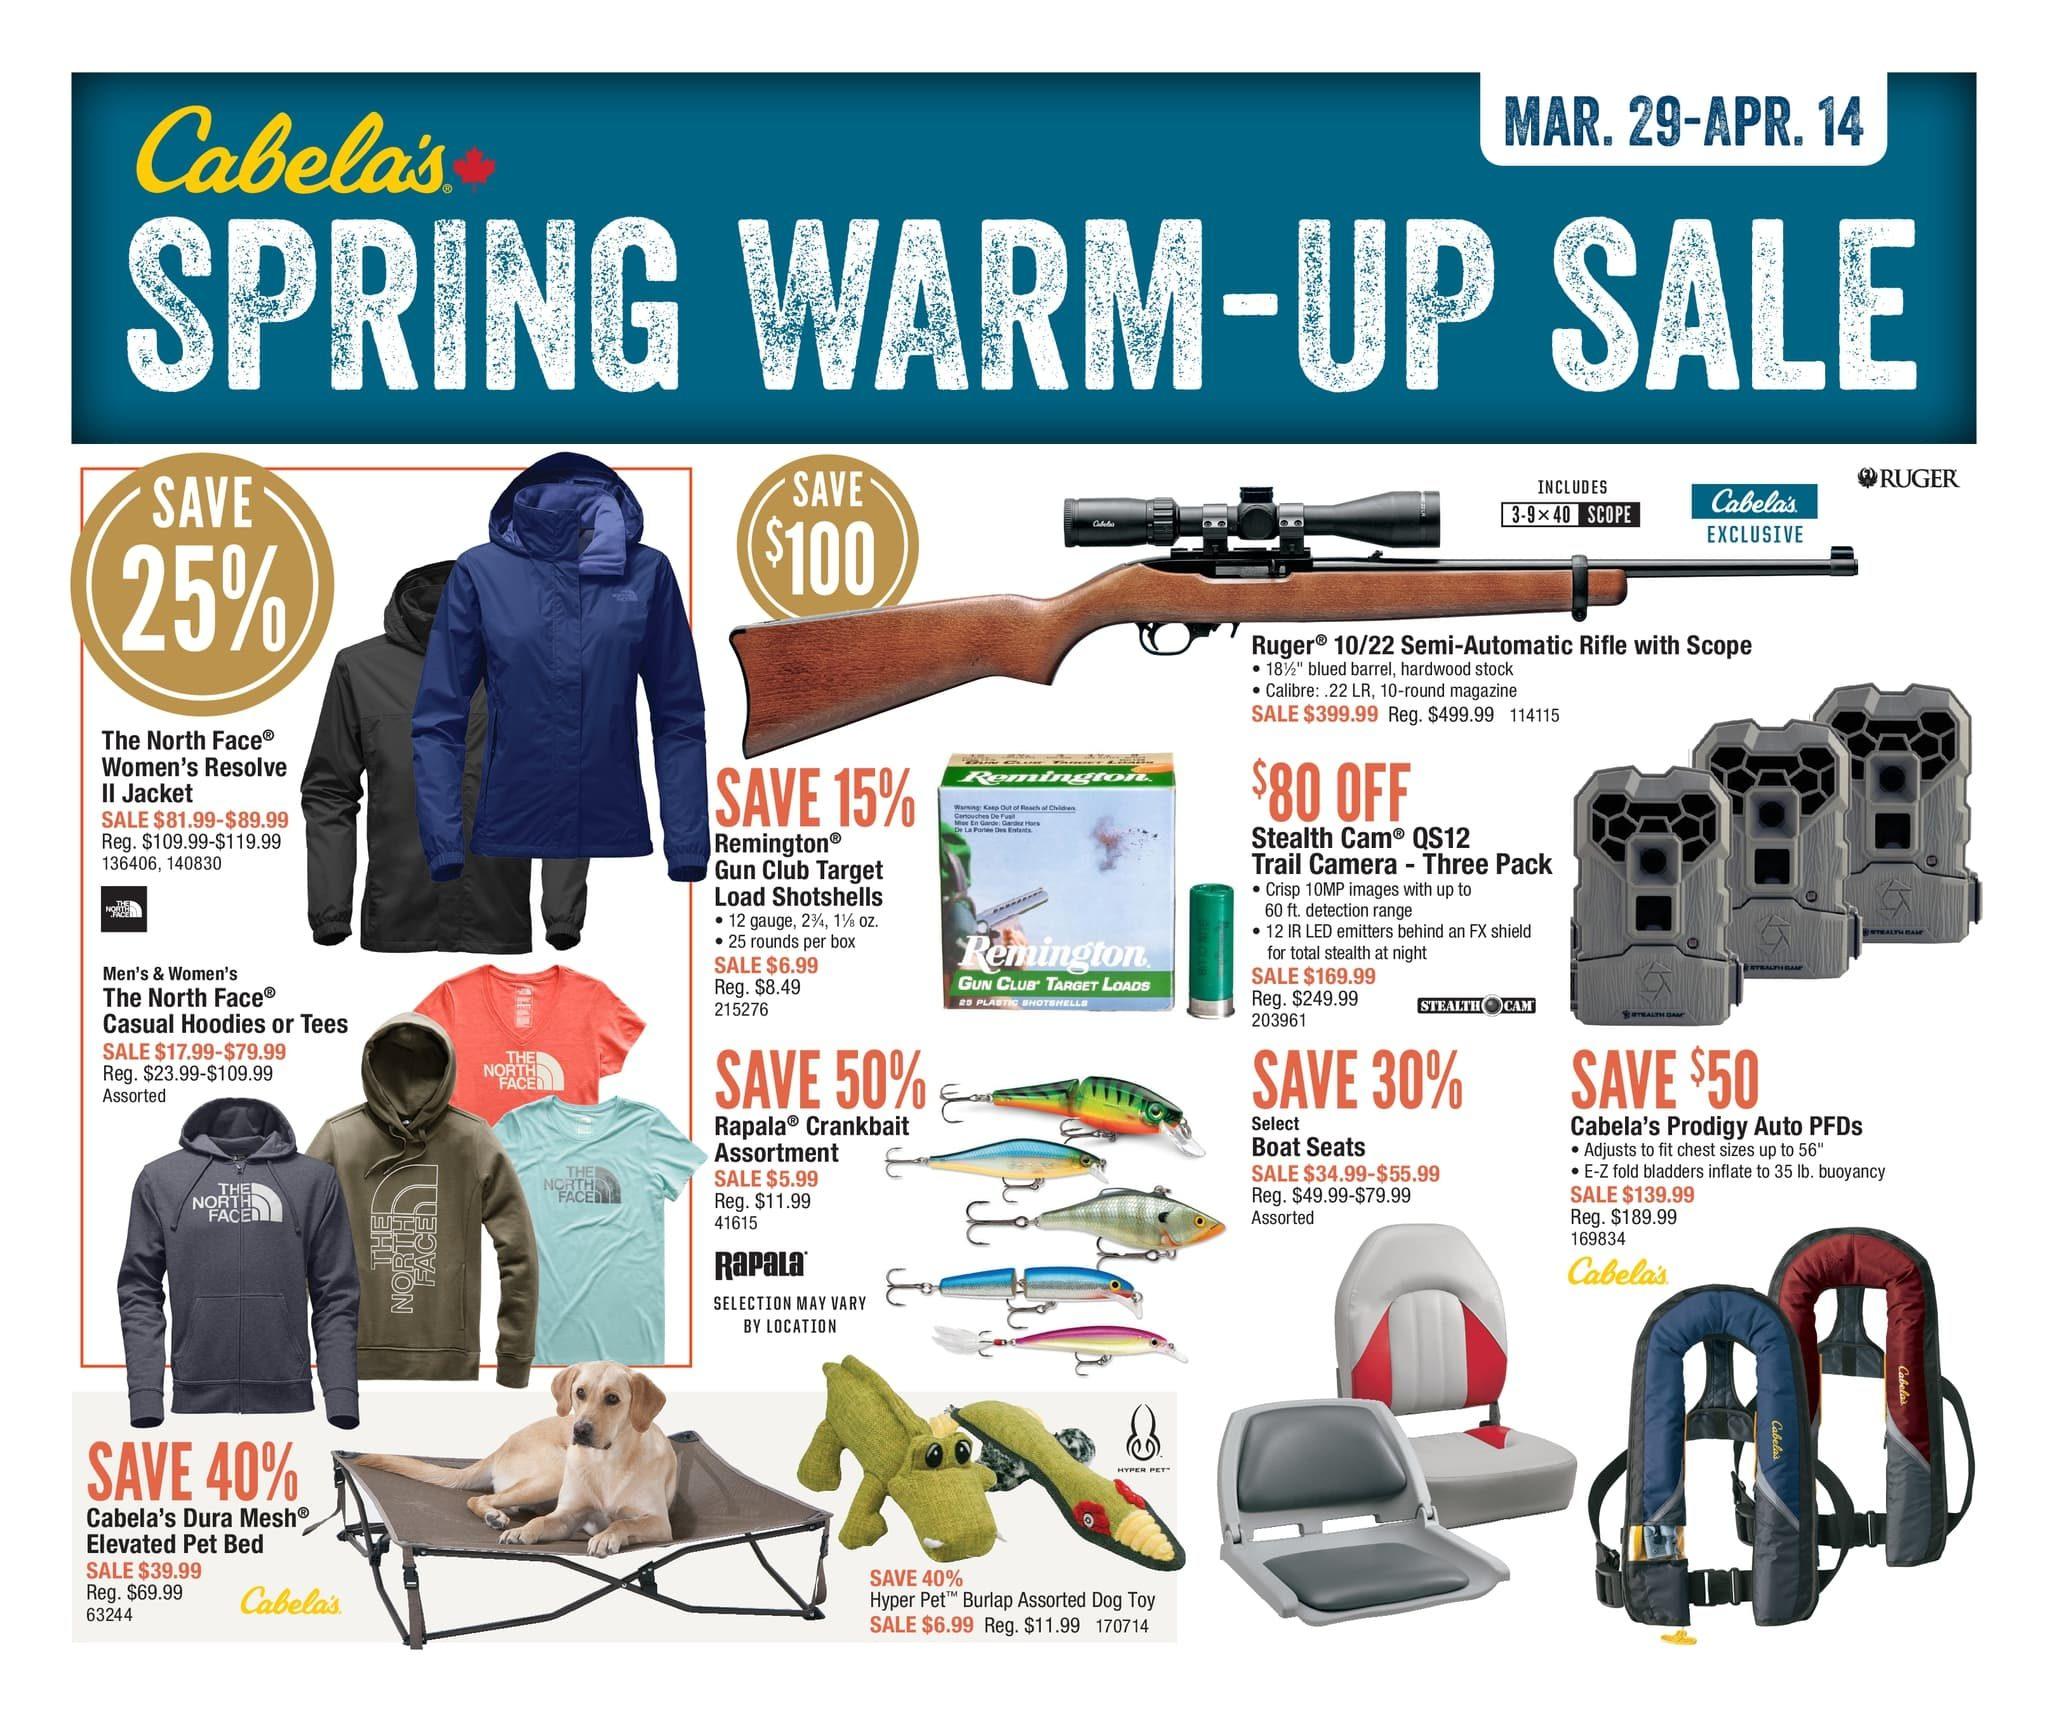 Cabelas Weekly Flyer - Spring Warm-Up Sale - Mar 29 – Apr 14